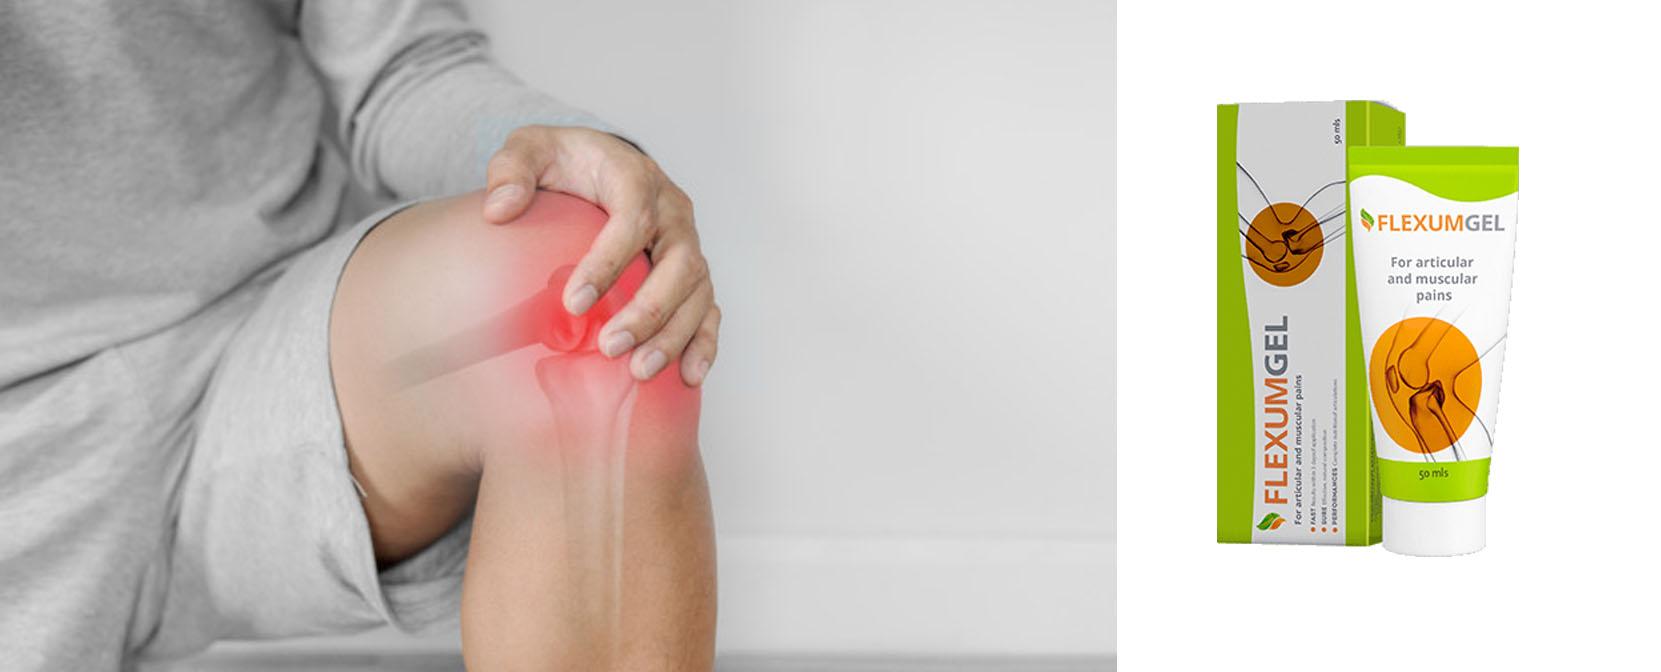 gel dolori articolari flexumgel